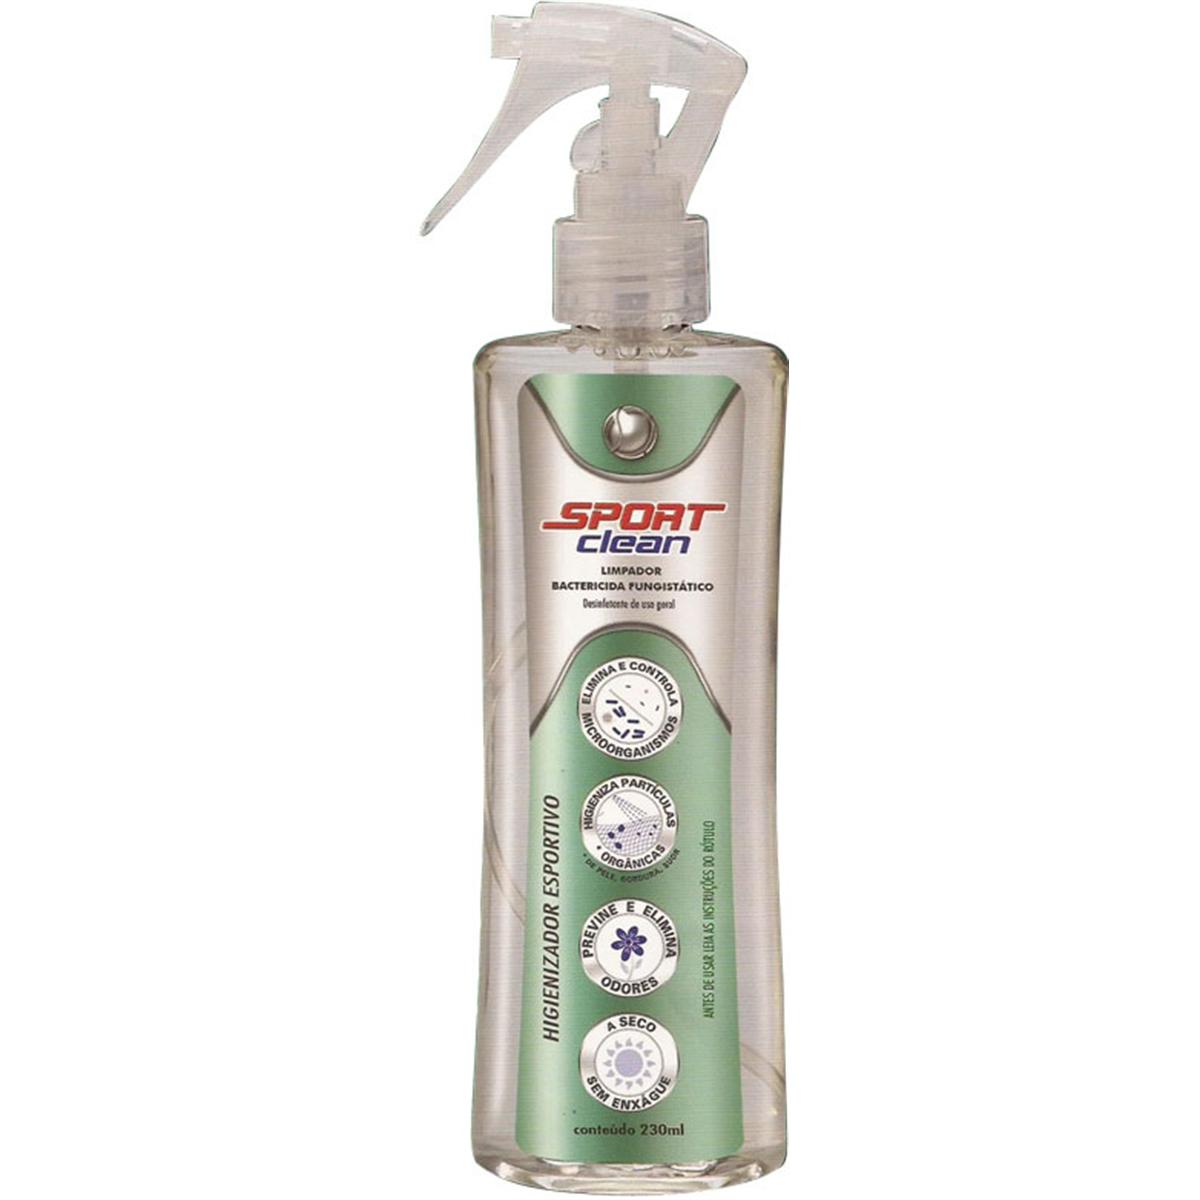 Desodorizador de Capacetes (SPORT CLEAN 230ML)  - Nova Suzuki Motos e Acessórios